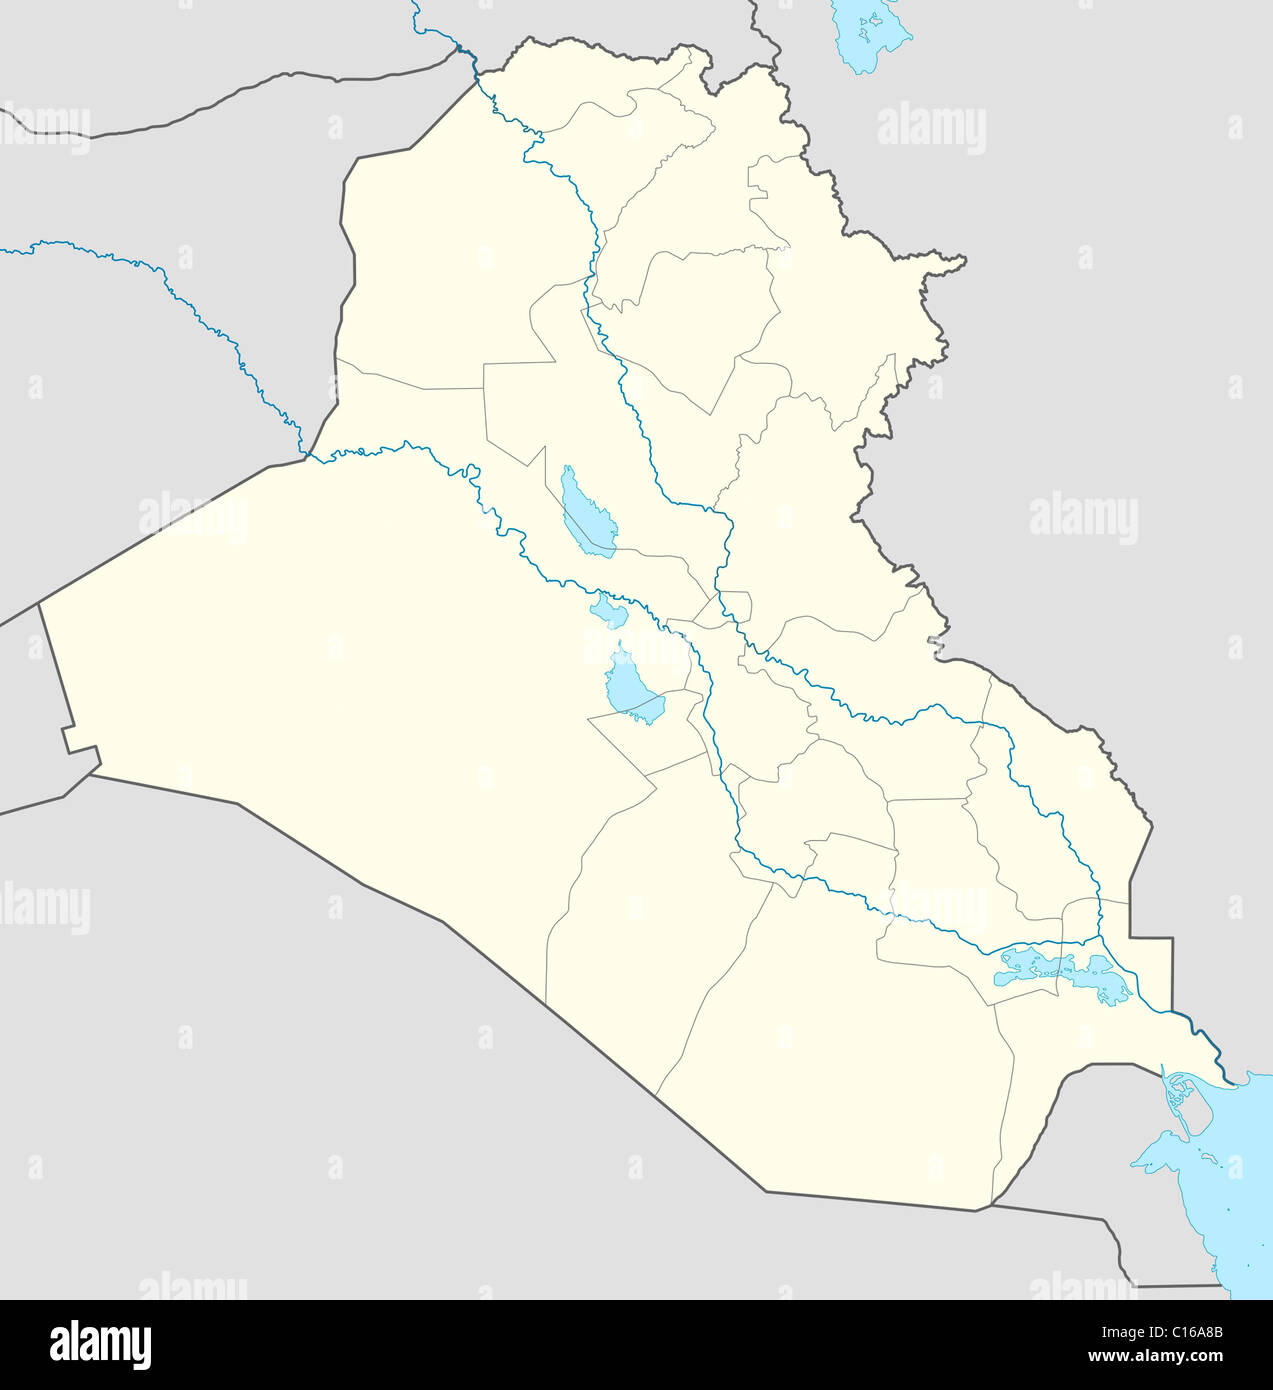 Iraq Map Stock Photos & Iraq Map Stock Images - Alamy